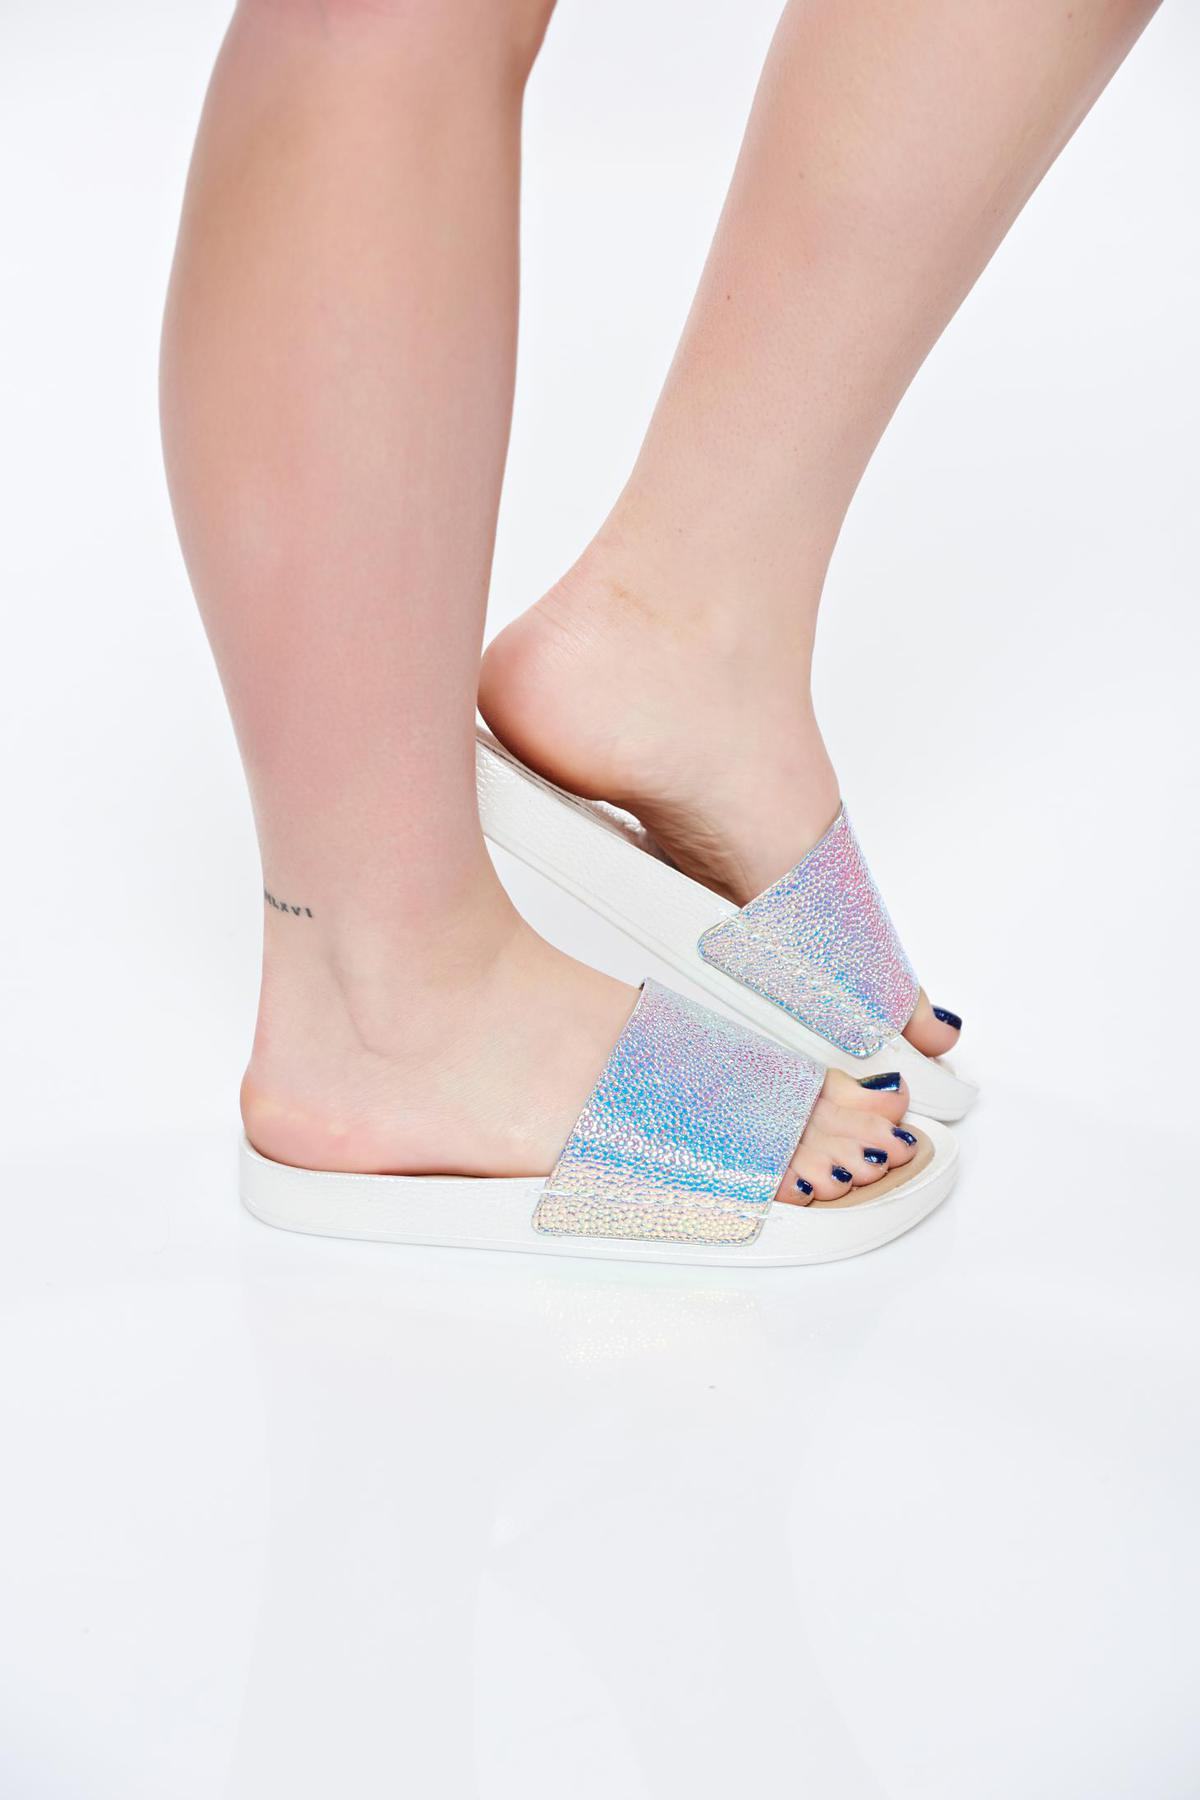 Papuci Missq Albe Casual Din Piele Naturala Cu Talpa Usoara